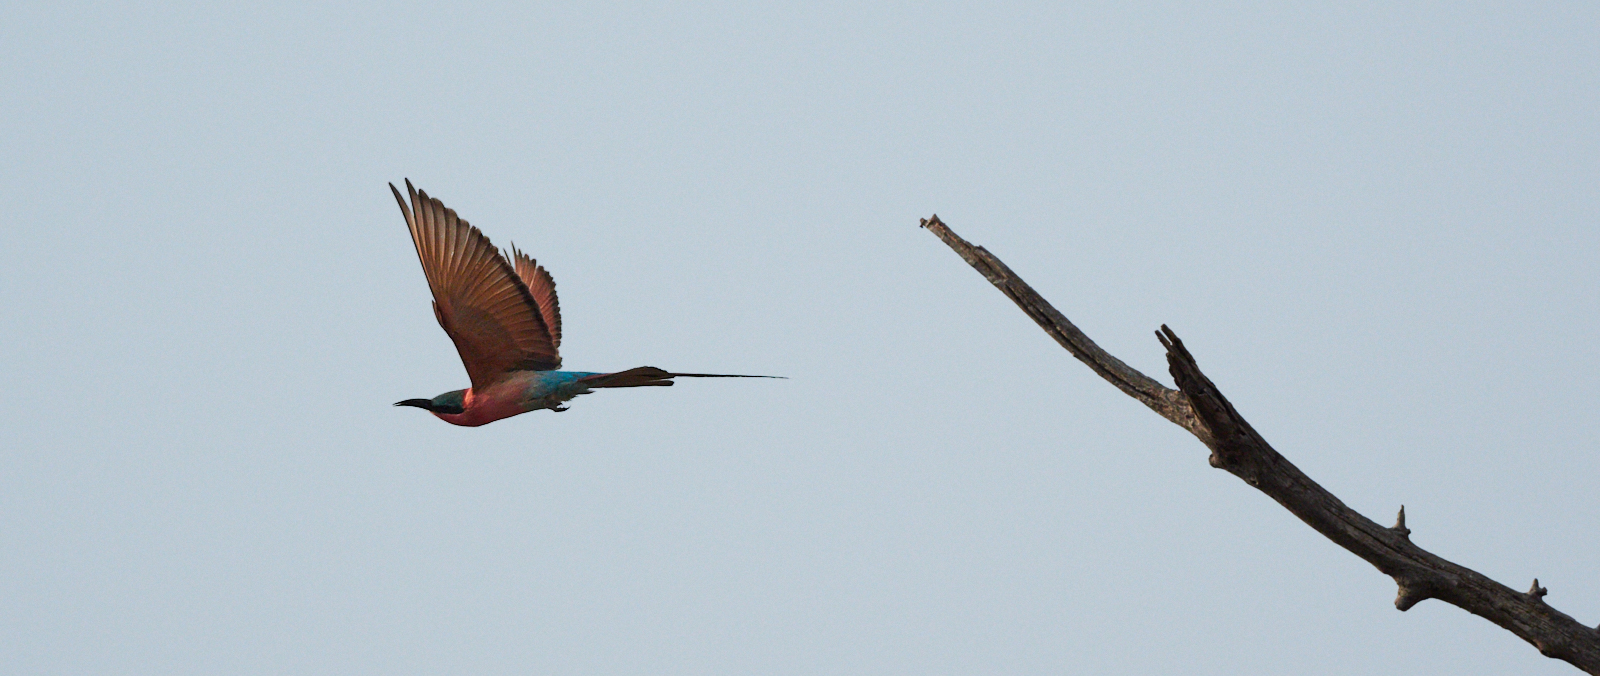 Carmine bee-eater takeoff 1600x1200 sRGB.jpg